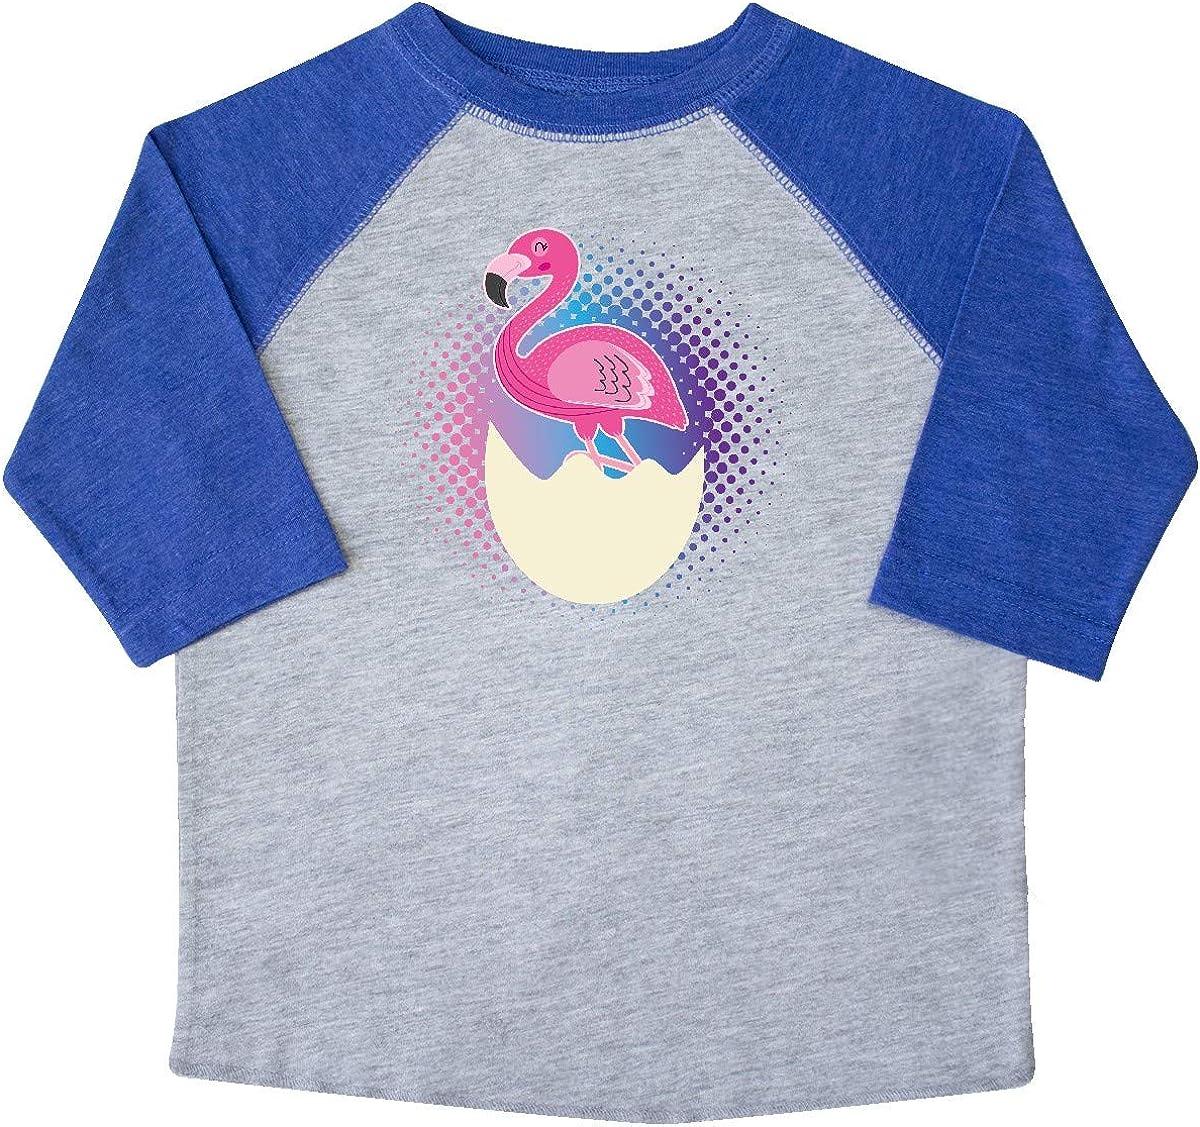 inktastic Easter Gift for Girls Flamingo Egg Hatching Toddler T-Shirt